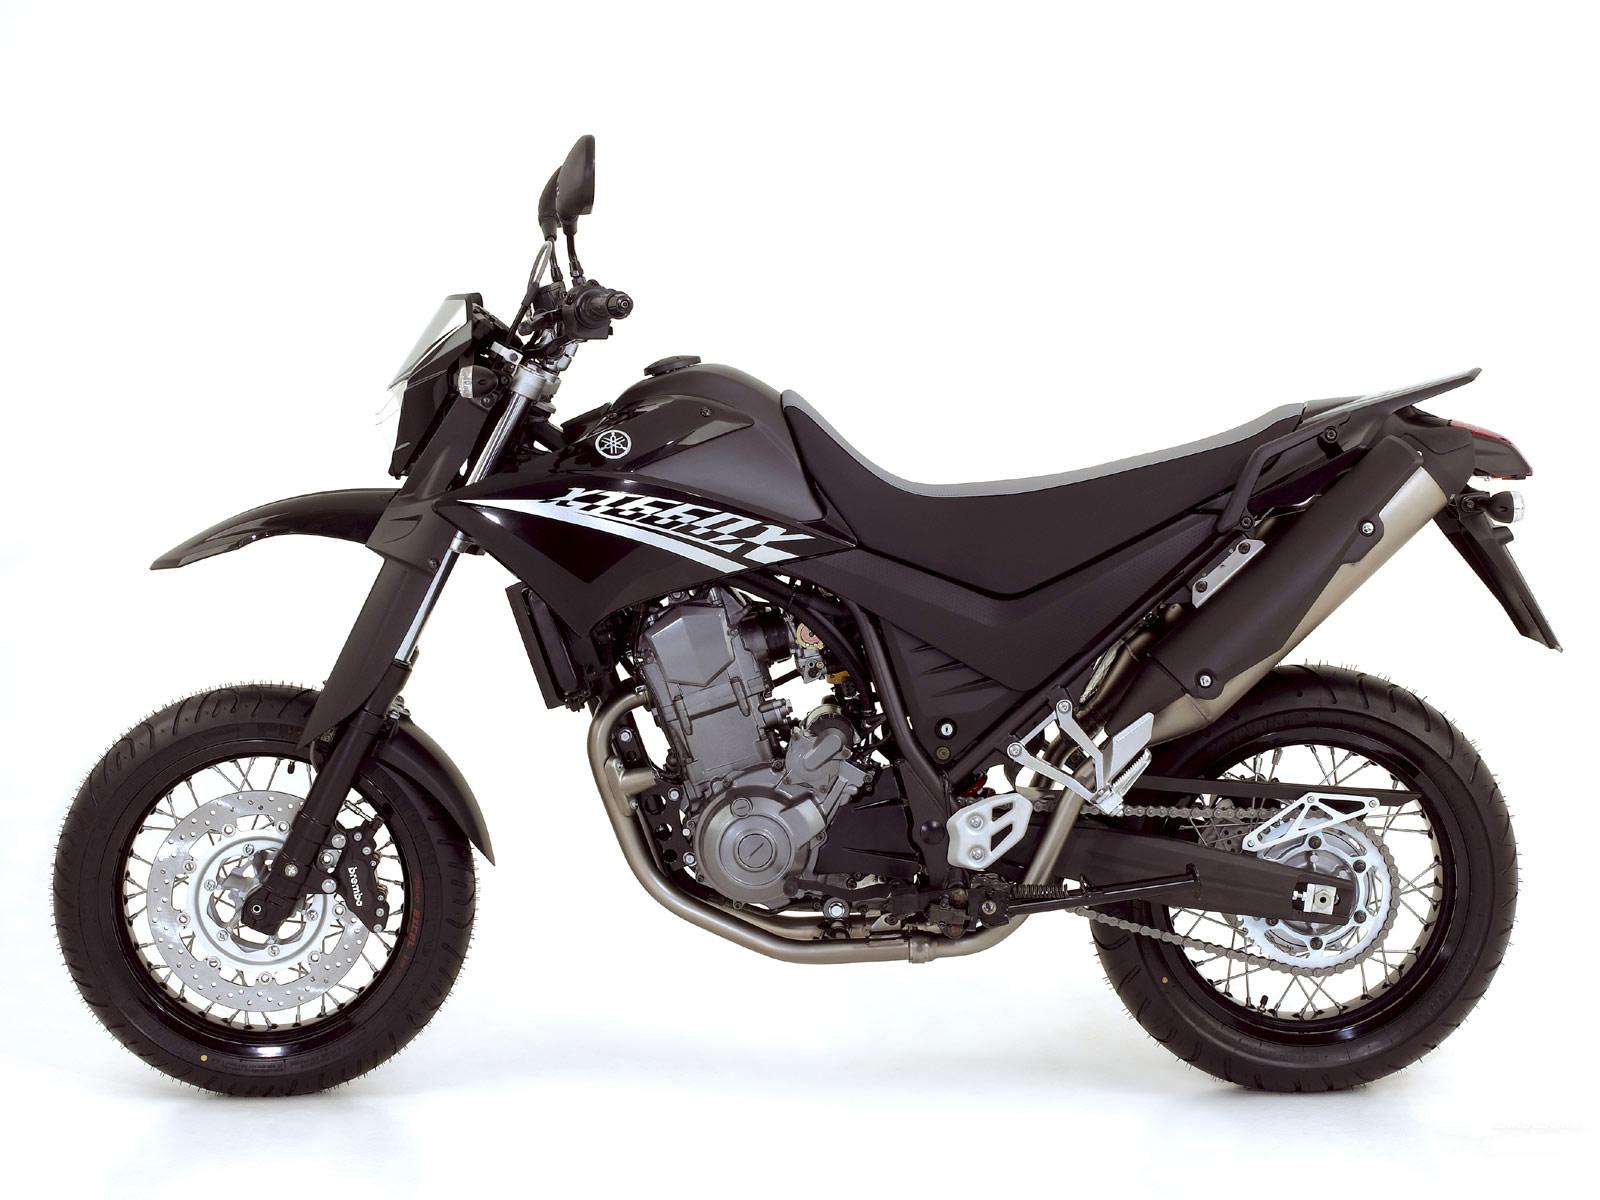 2007 yamaha xt660x motorcycle photos. Black Bedroom Furniture Sets. Home Design Ideas